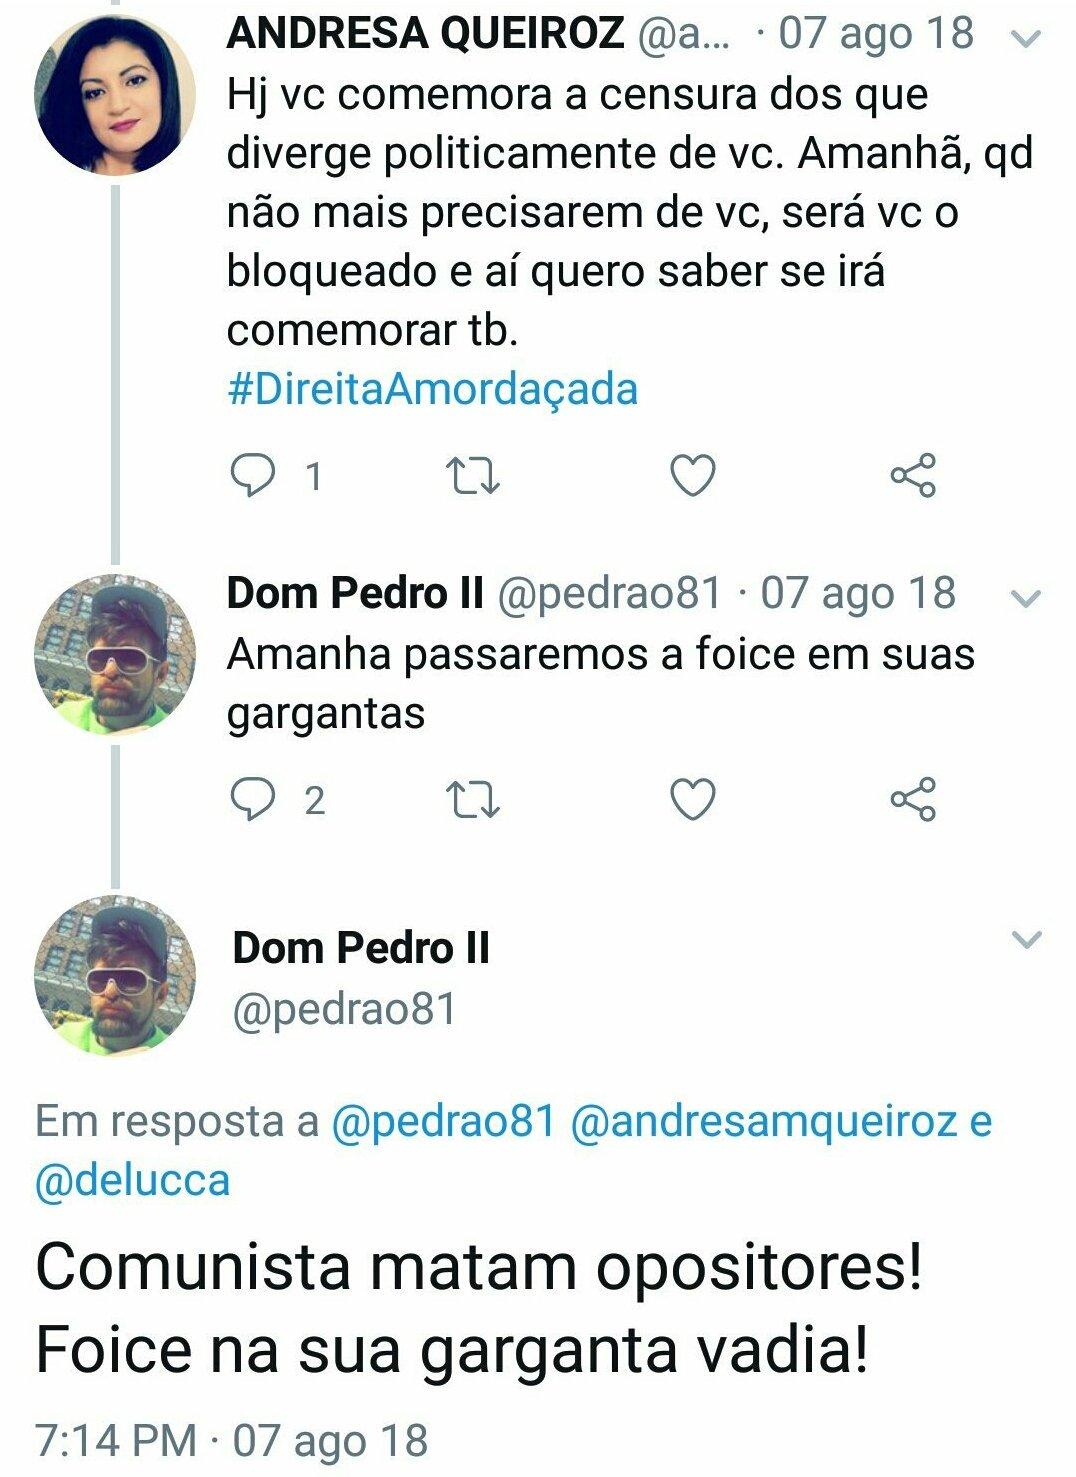 Tweet de esquerdista ameaçando cortar gargantas no Twitter. Via @odiodobem